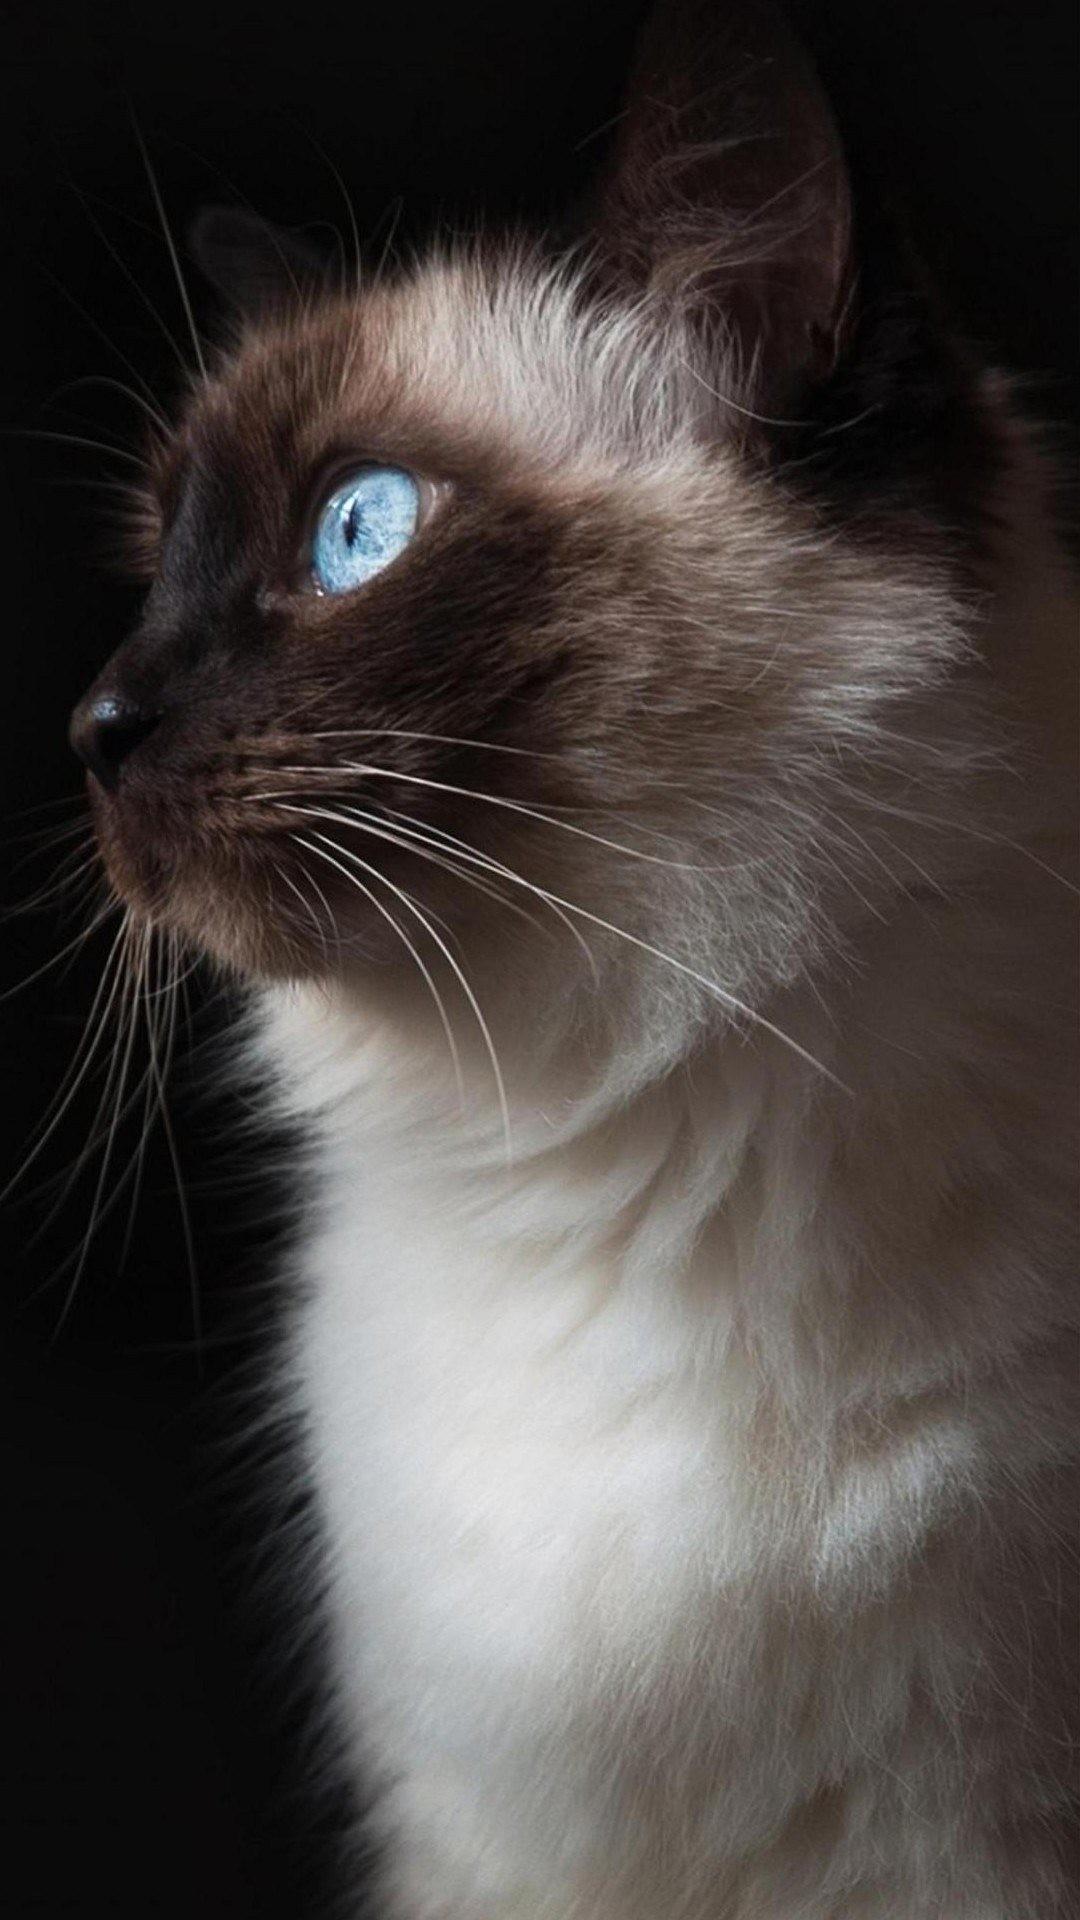 Z wallpaper full hd 1080 x 1920 smartphone beautiful cat